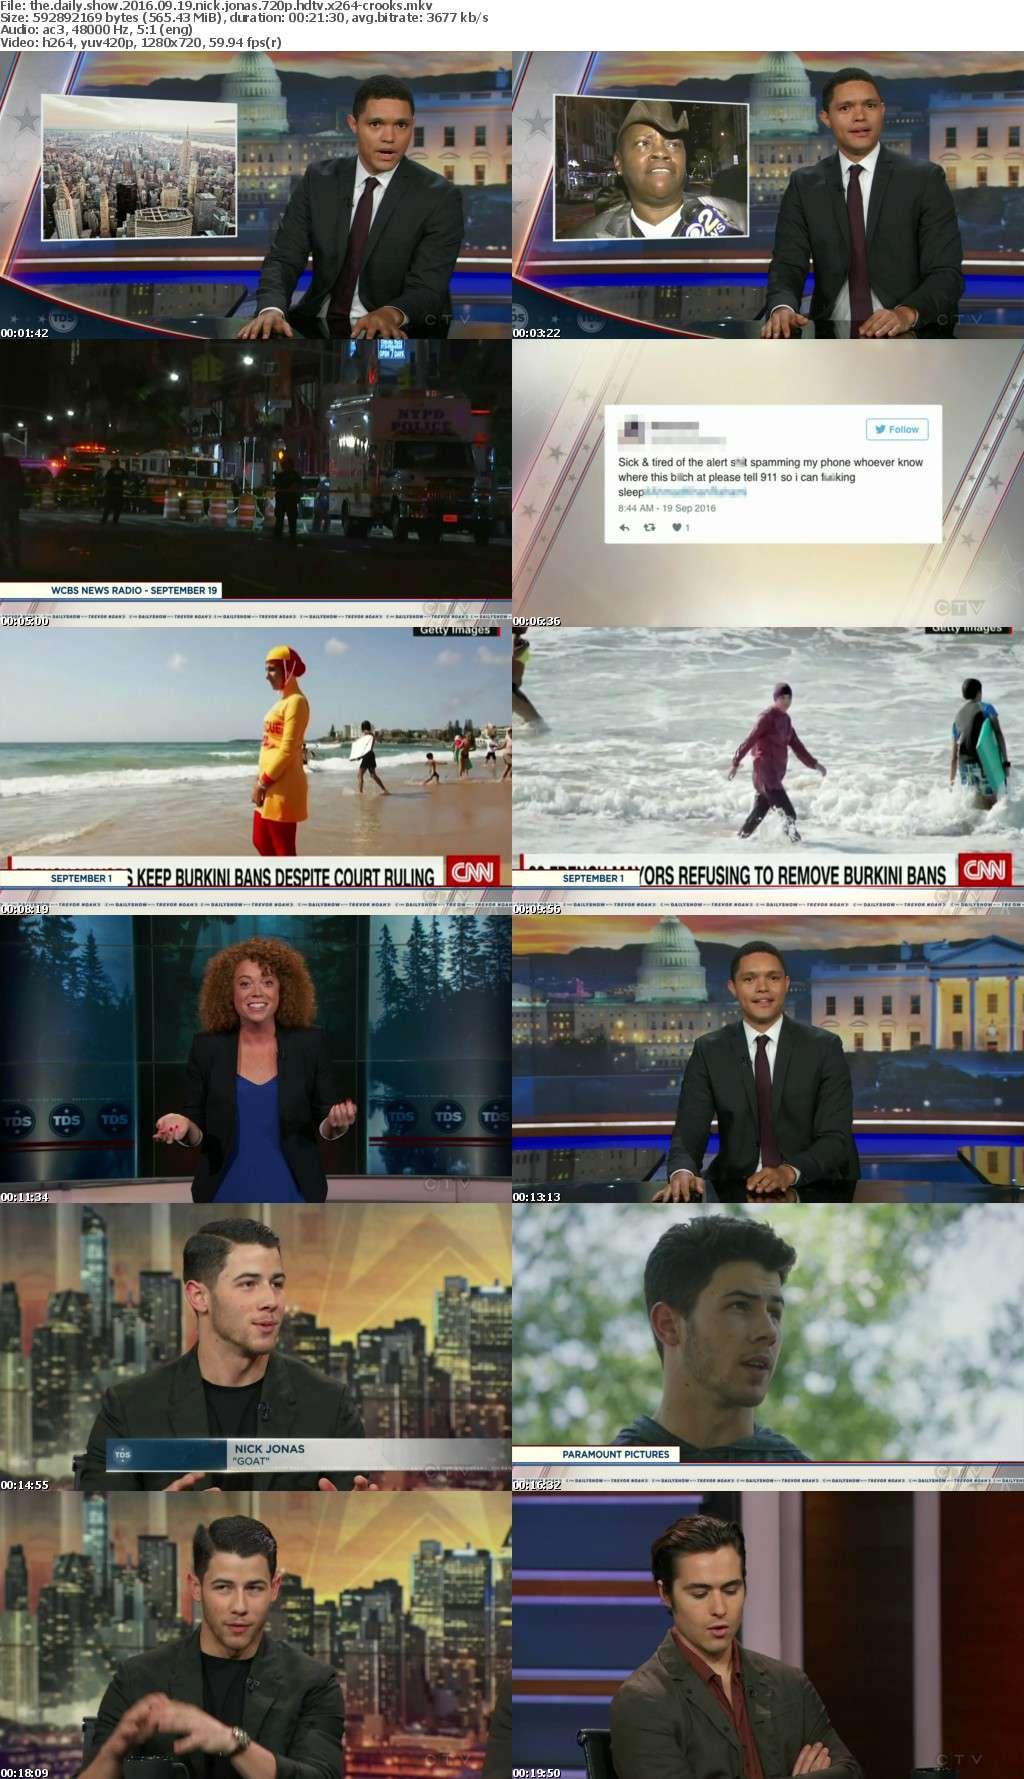 The Daily Show 2016 09 19 Nick Jonas 720p HDTV x264-CROOKS